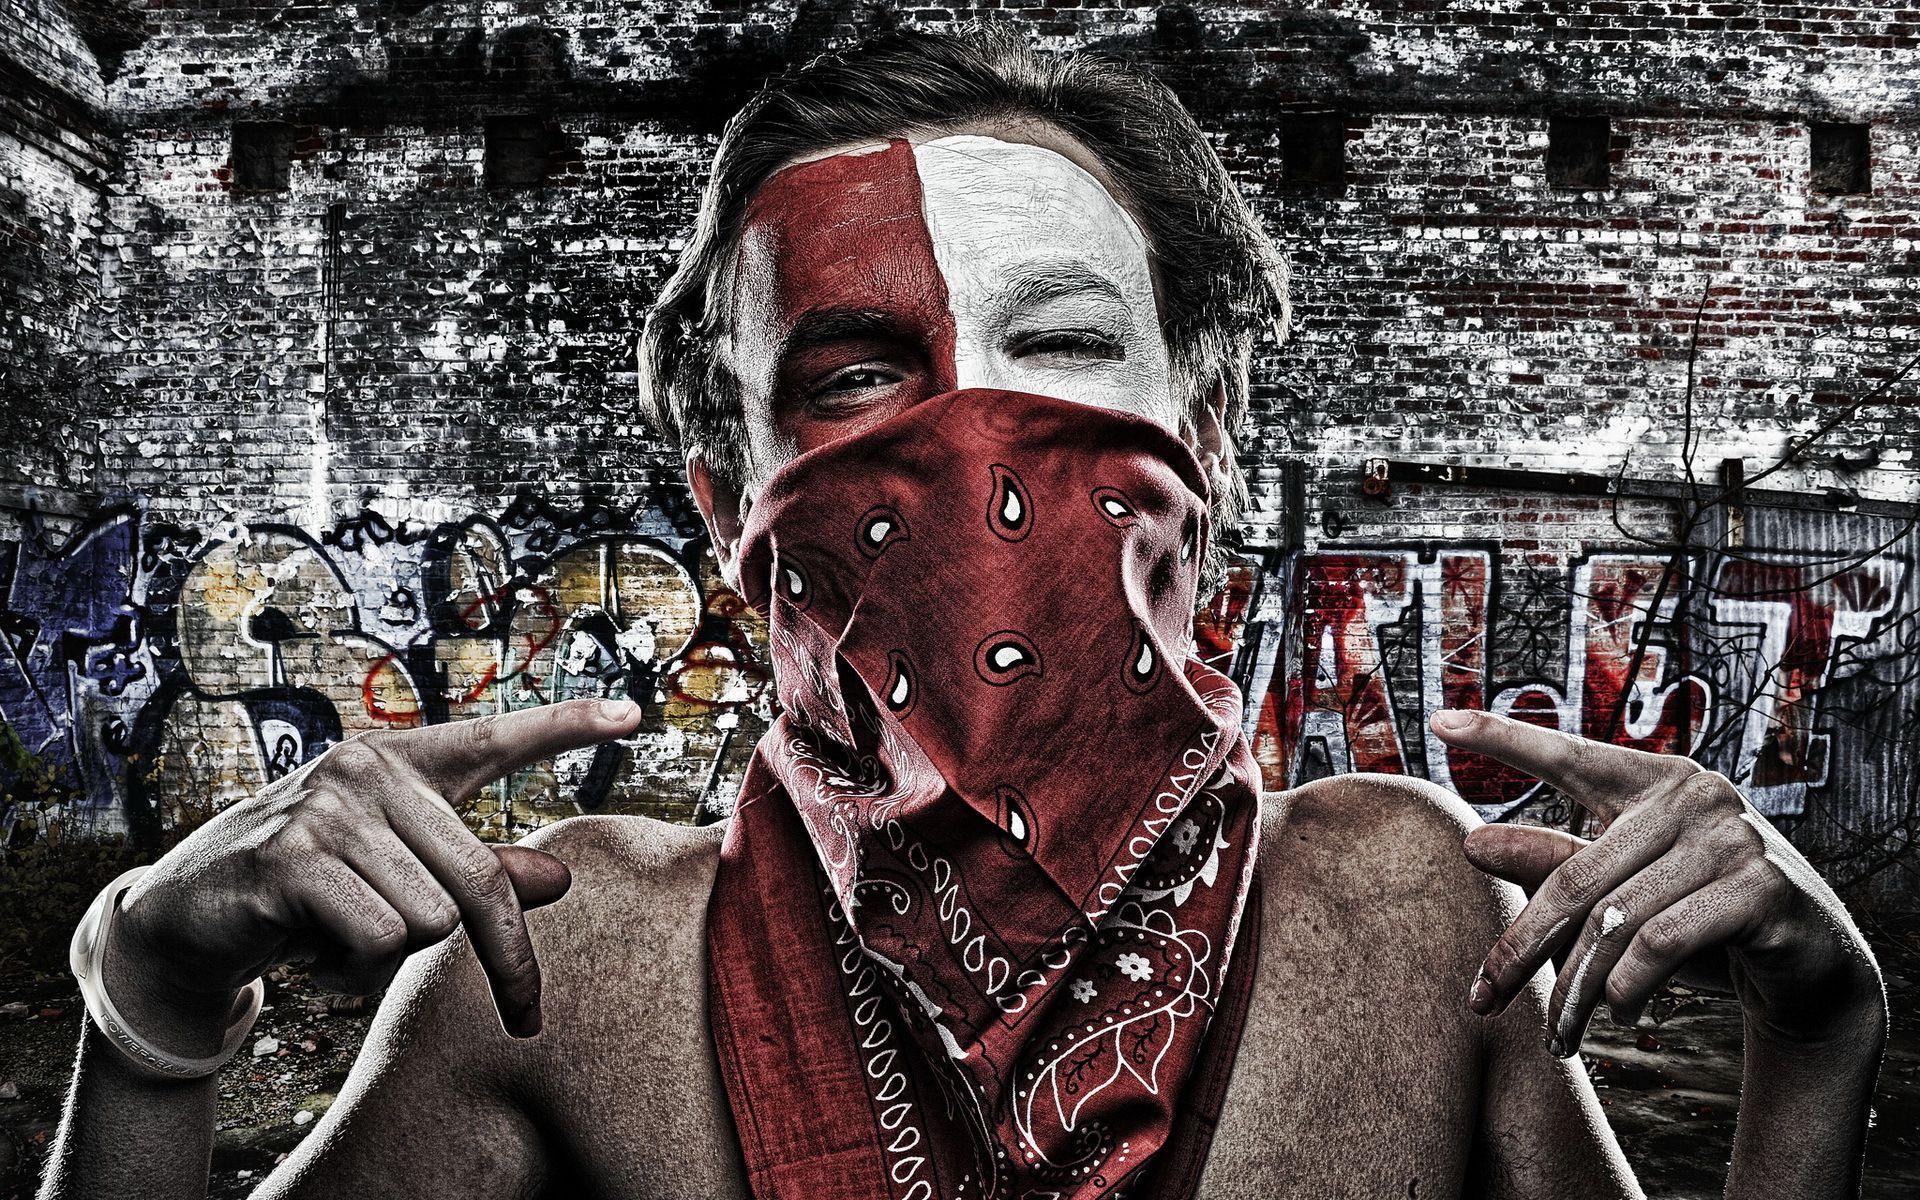 Gangster Mask Graffiti Wallpapers Wallpaper Cave